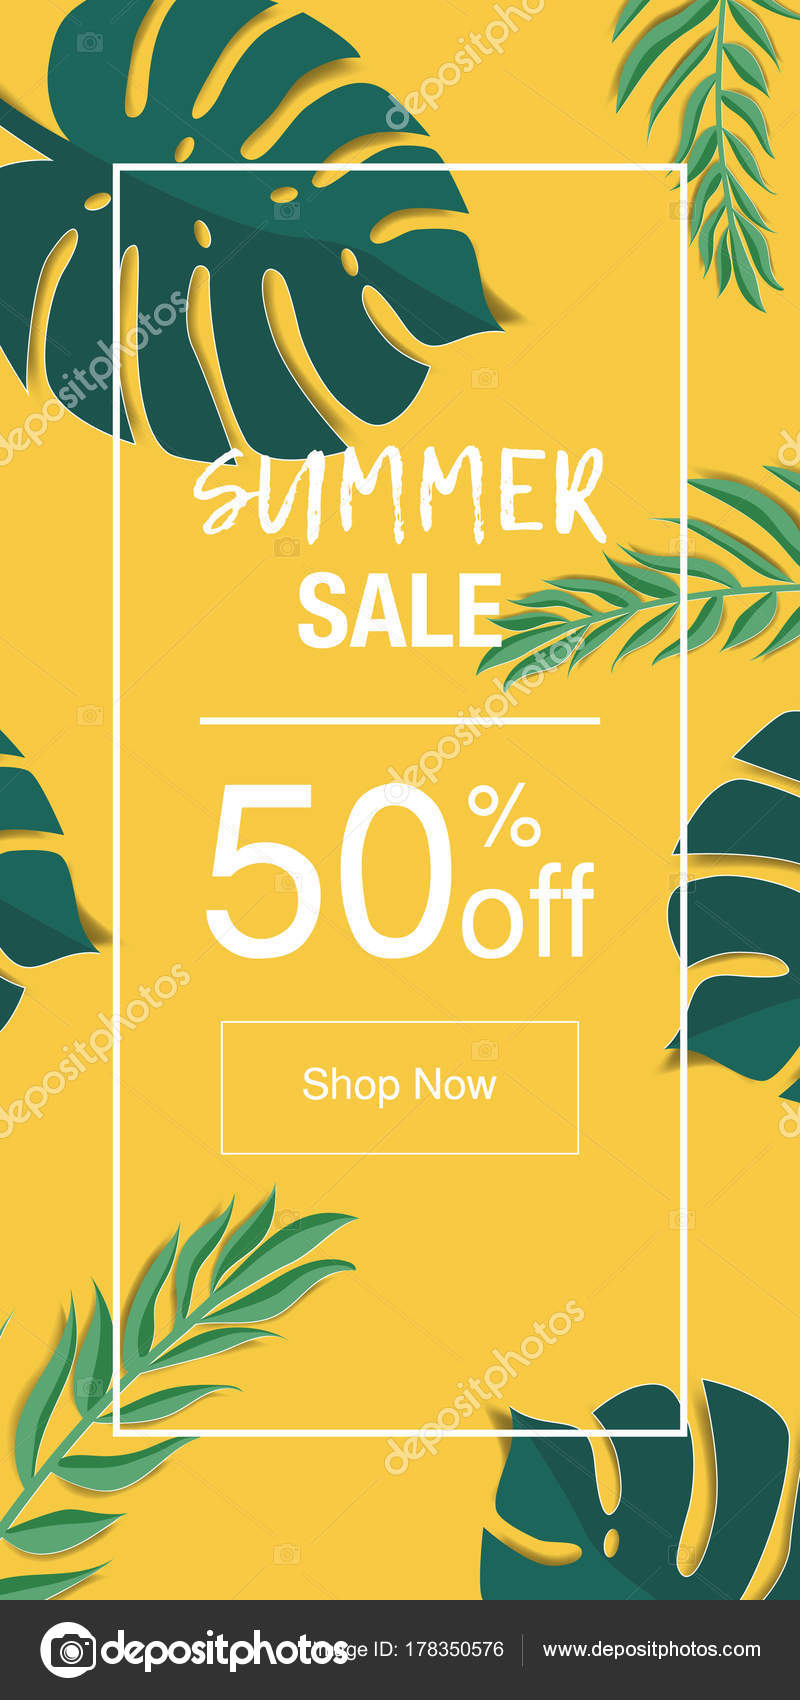 Summer Vector Design Wallpaper Greeting Card Flyer Palm Leaves Stock